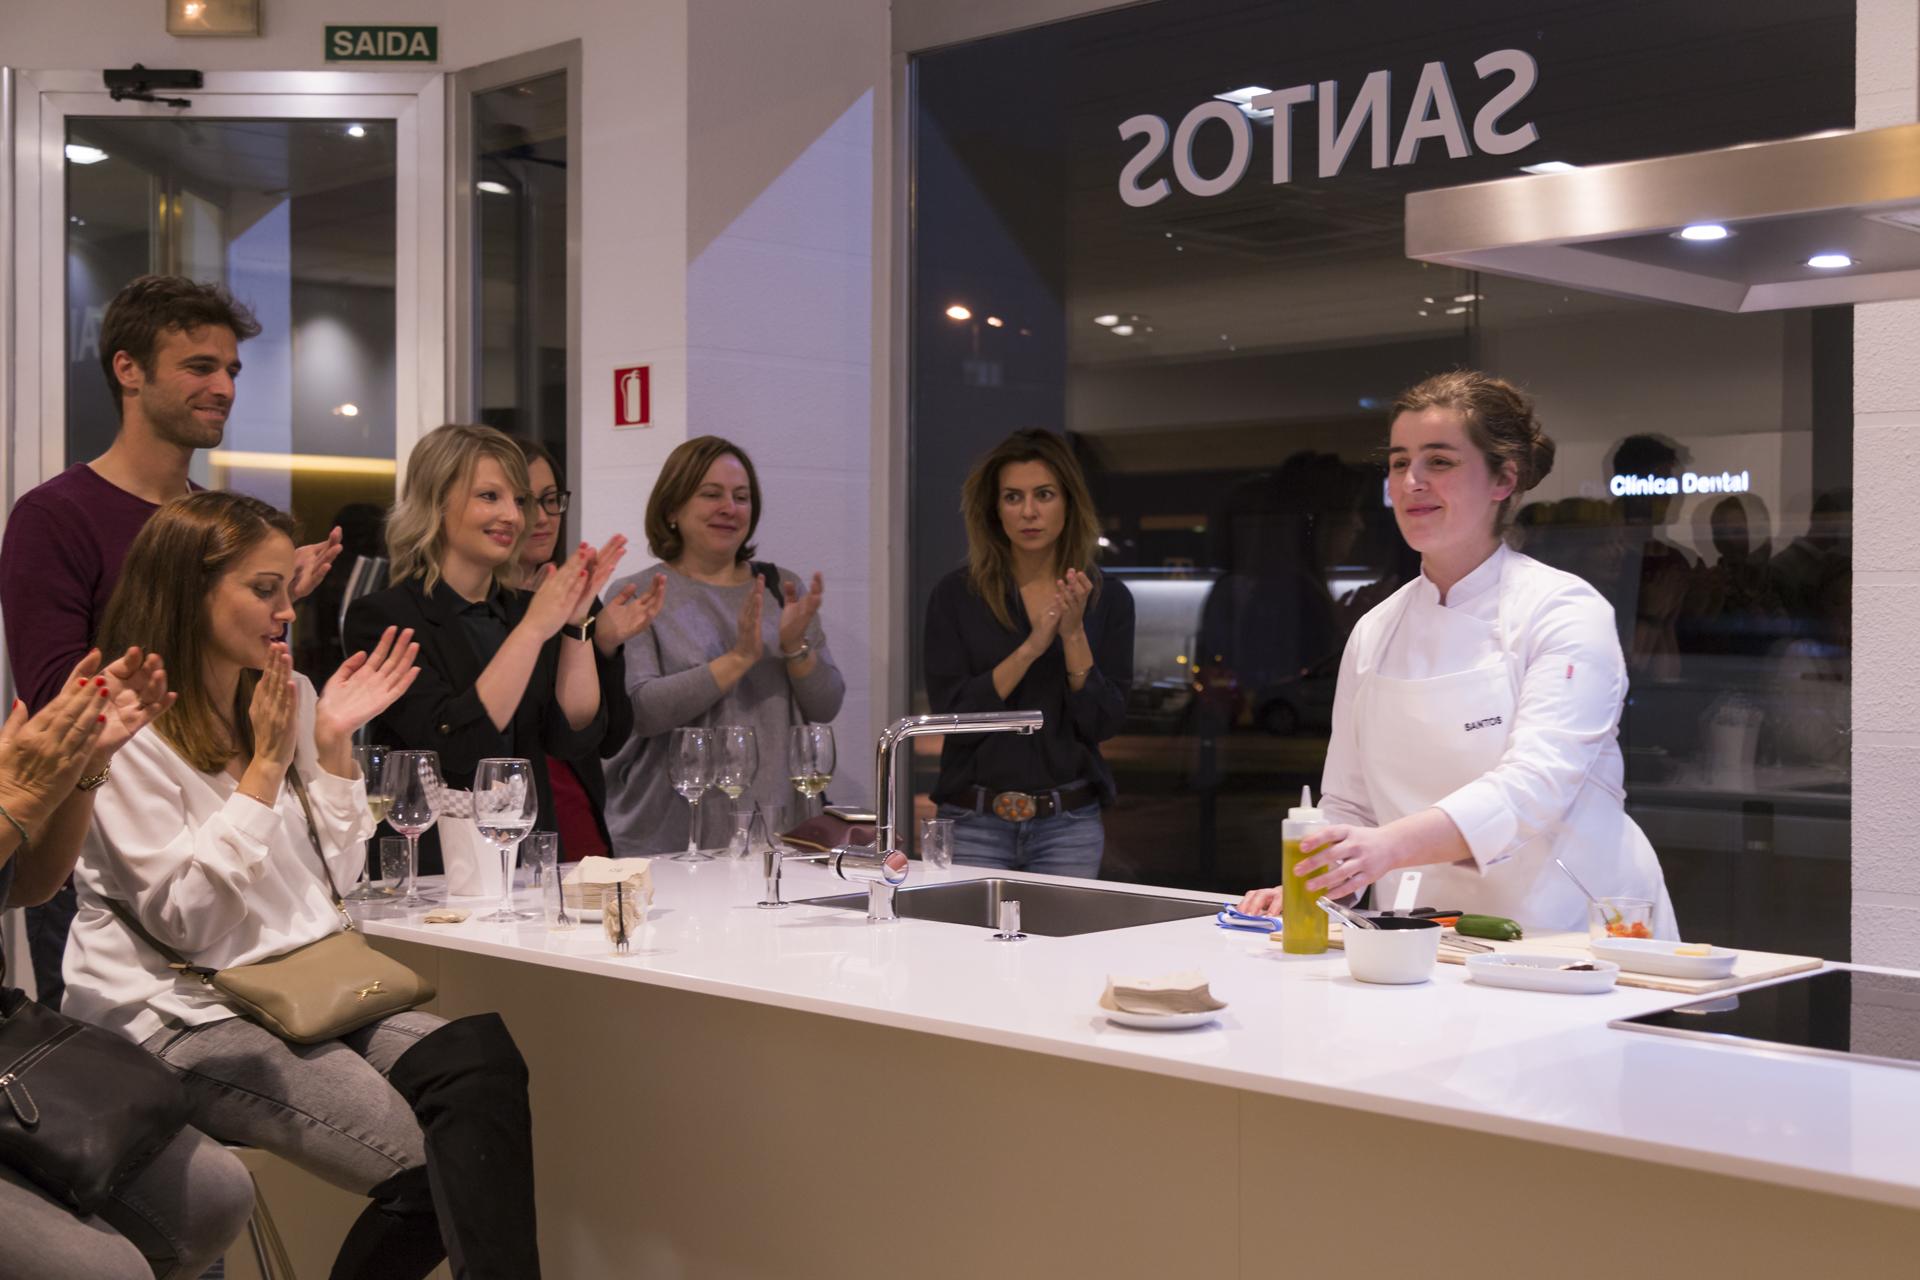 cocinas-santos-santiago-interiores-evento-showcooking-clientes-13